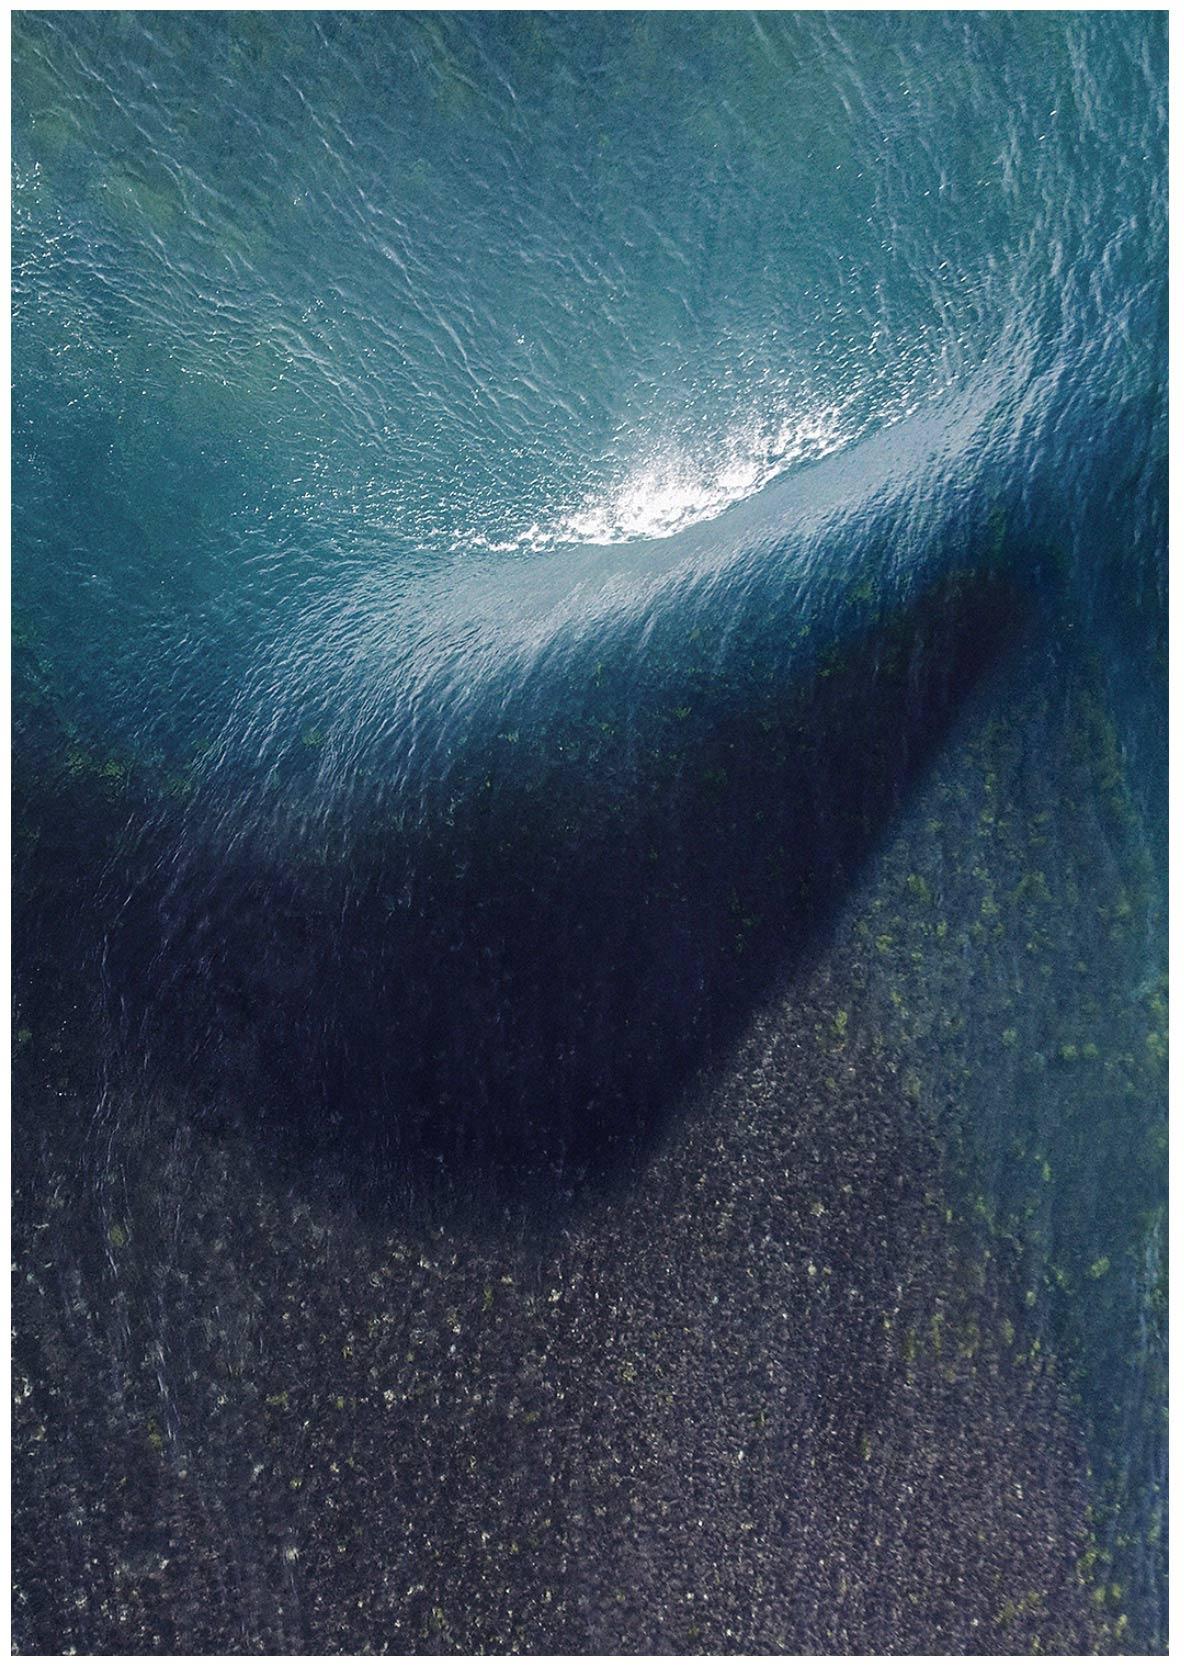 rodd-owen-ocean-surf-photography-for-sale-121.jpg